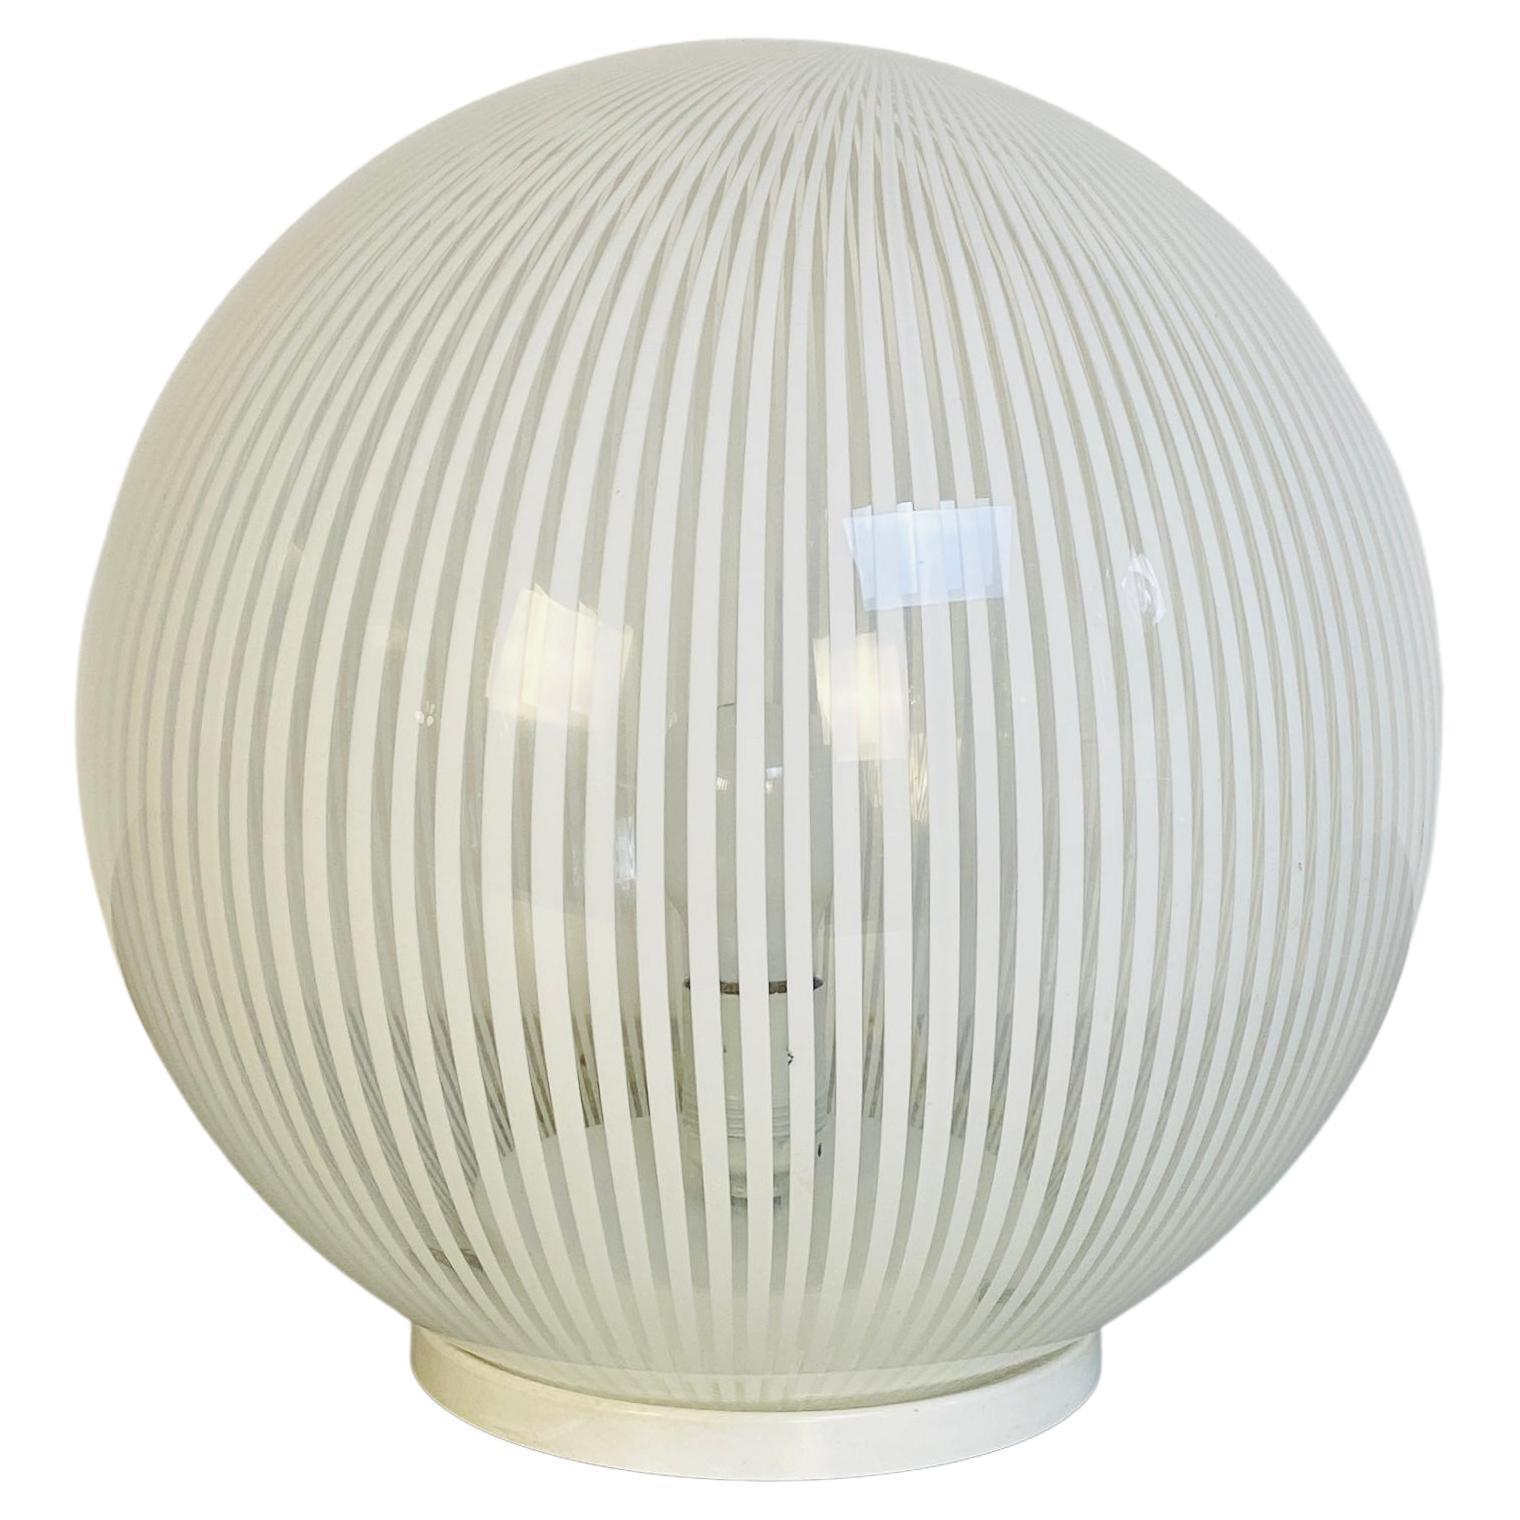 Sphere Table Lamp by L. Diaz De Santillana for Venini, Tessuti Series, 1970s